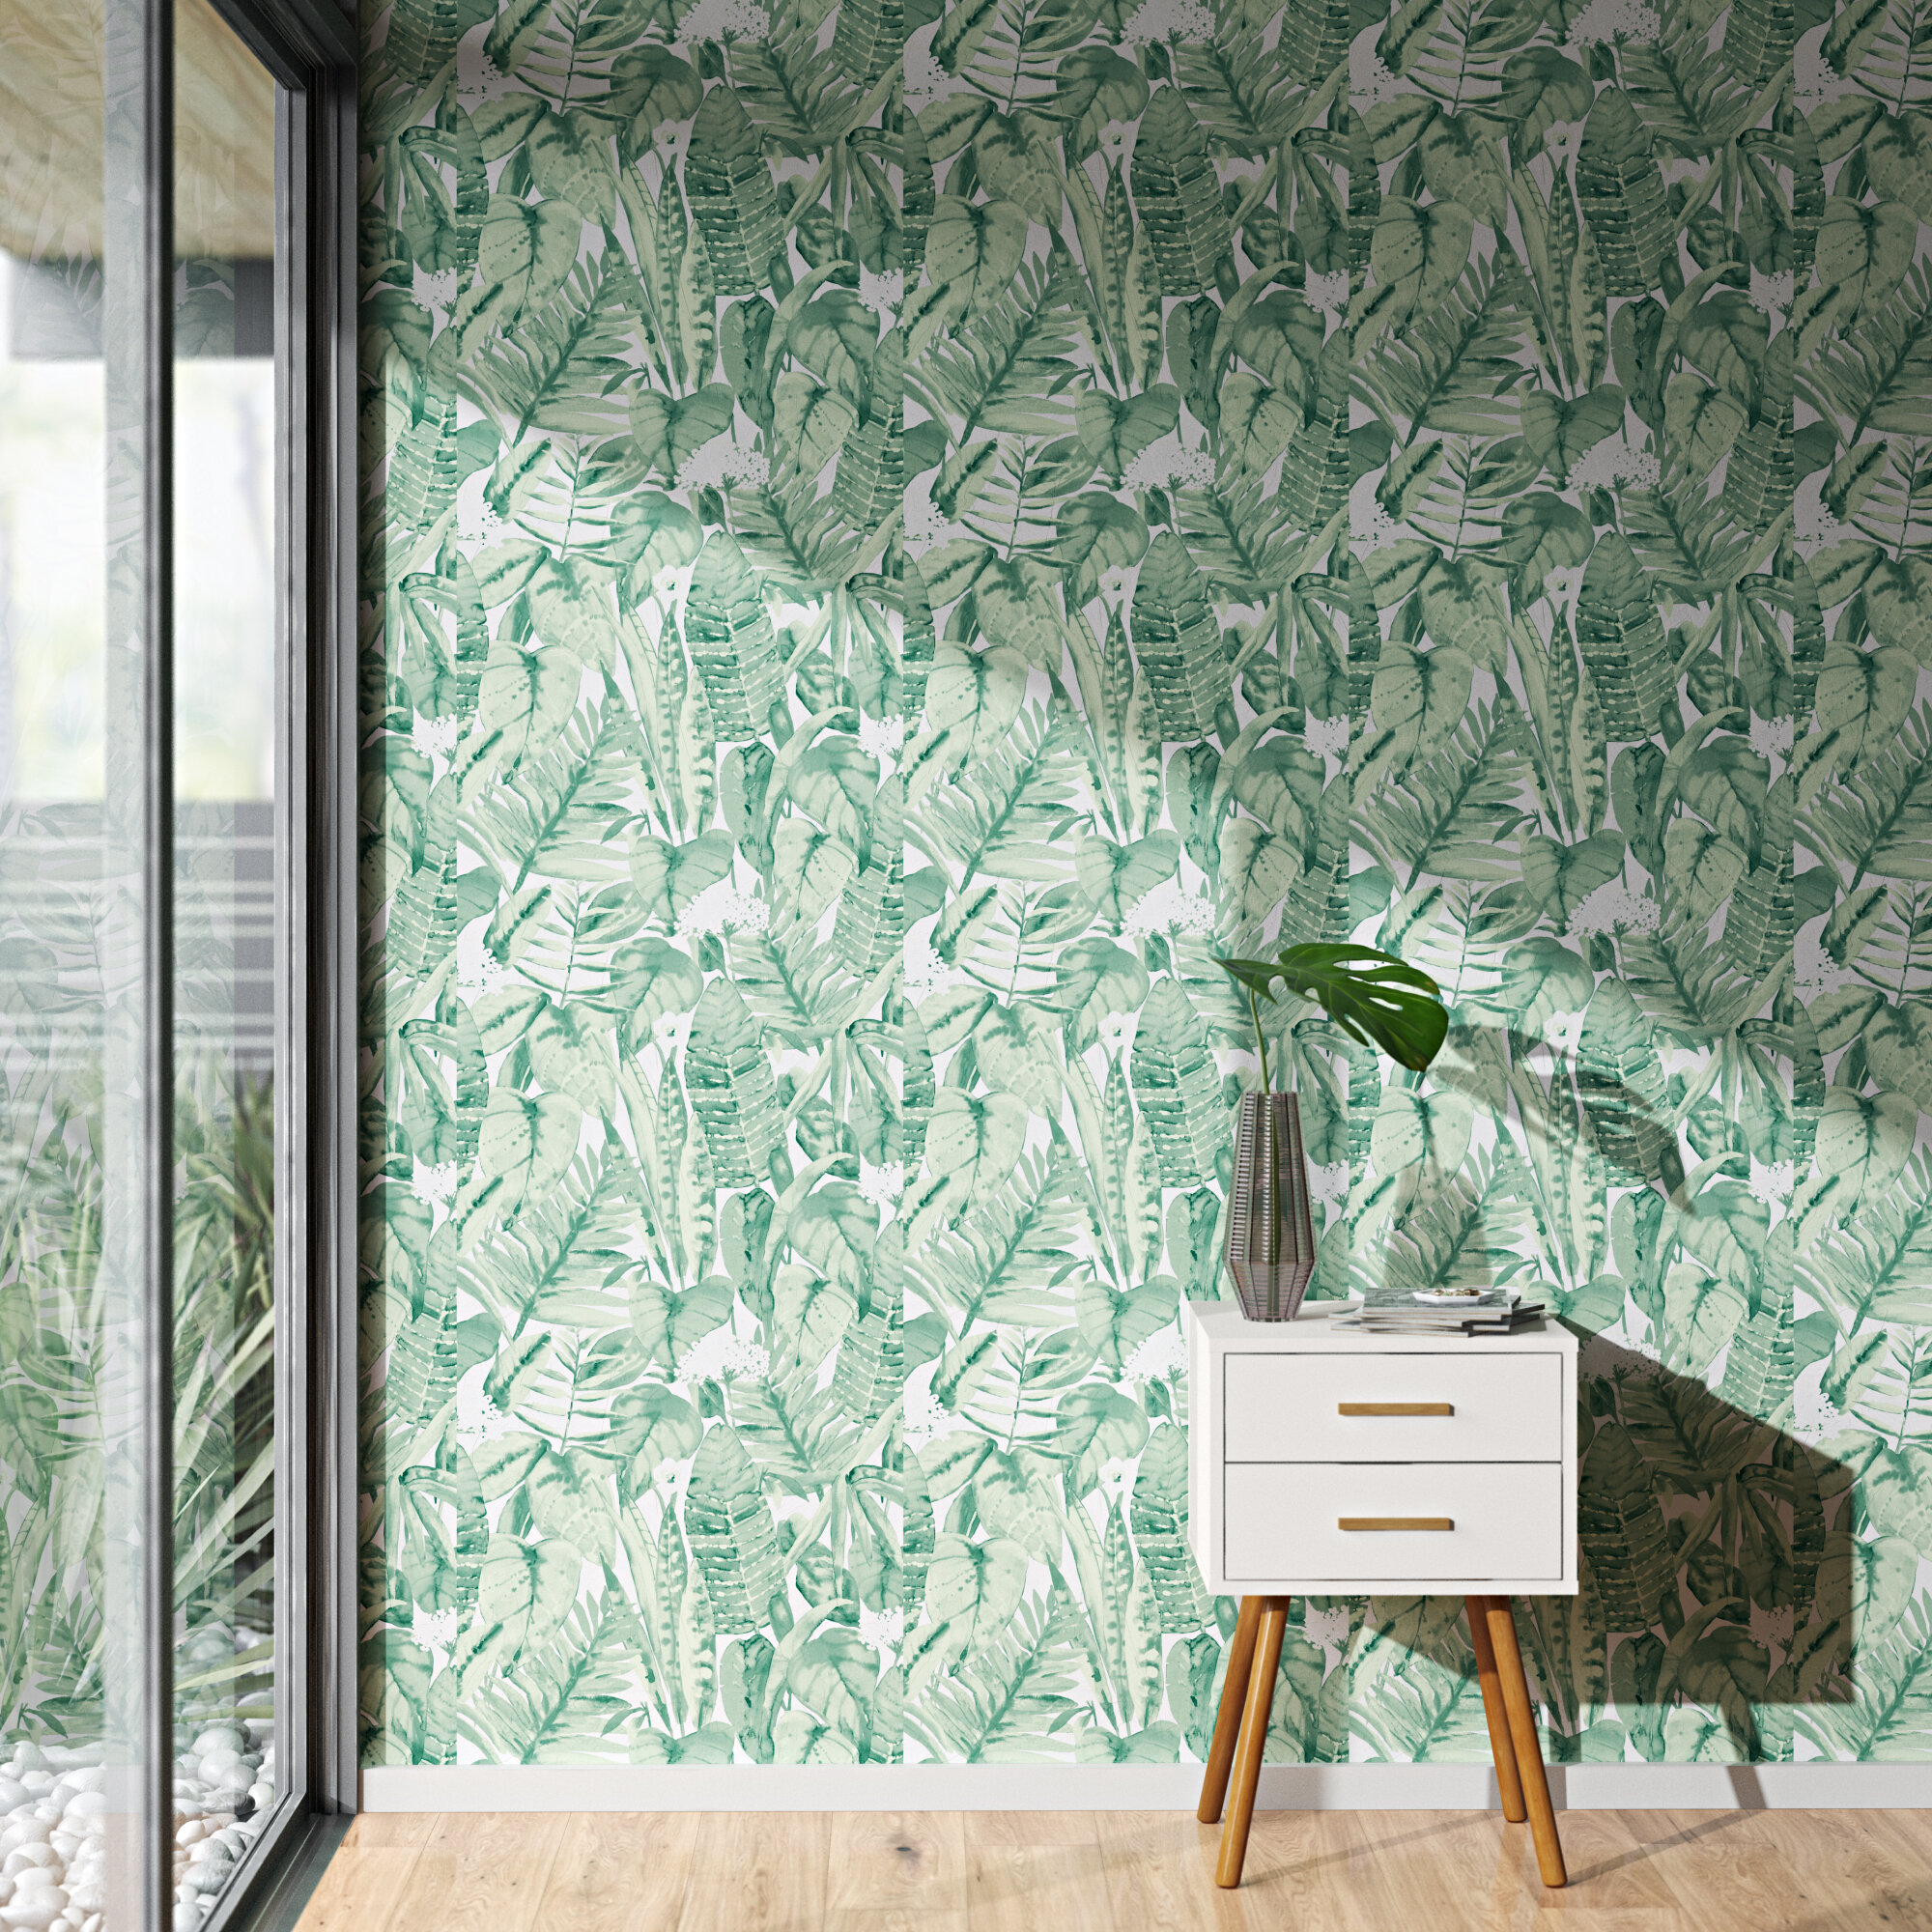 Barreto Tropical Jungle 16 5 L X 20 5 W Peel And Stick Wallpaper Roll Reviews Allmodern